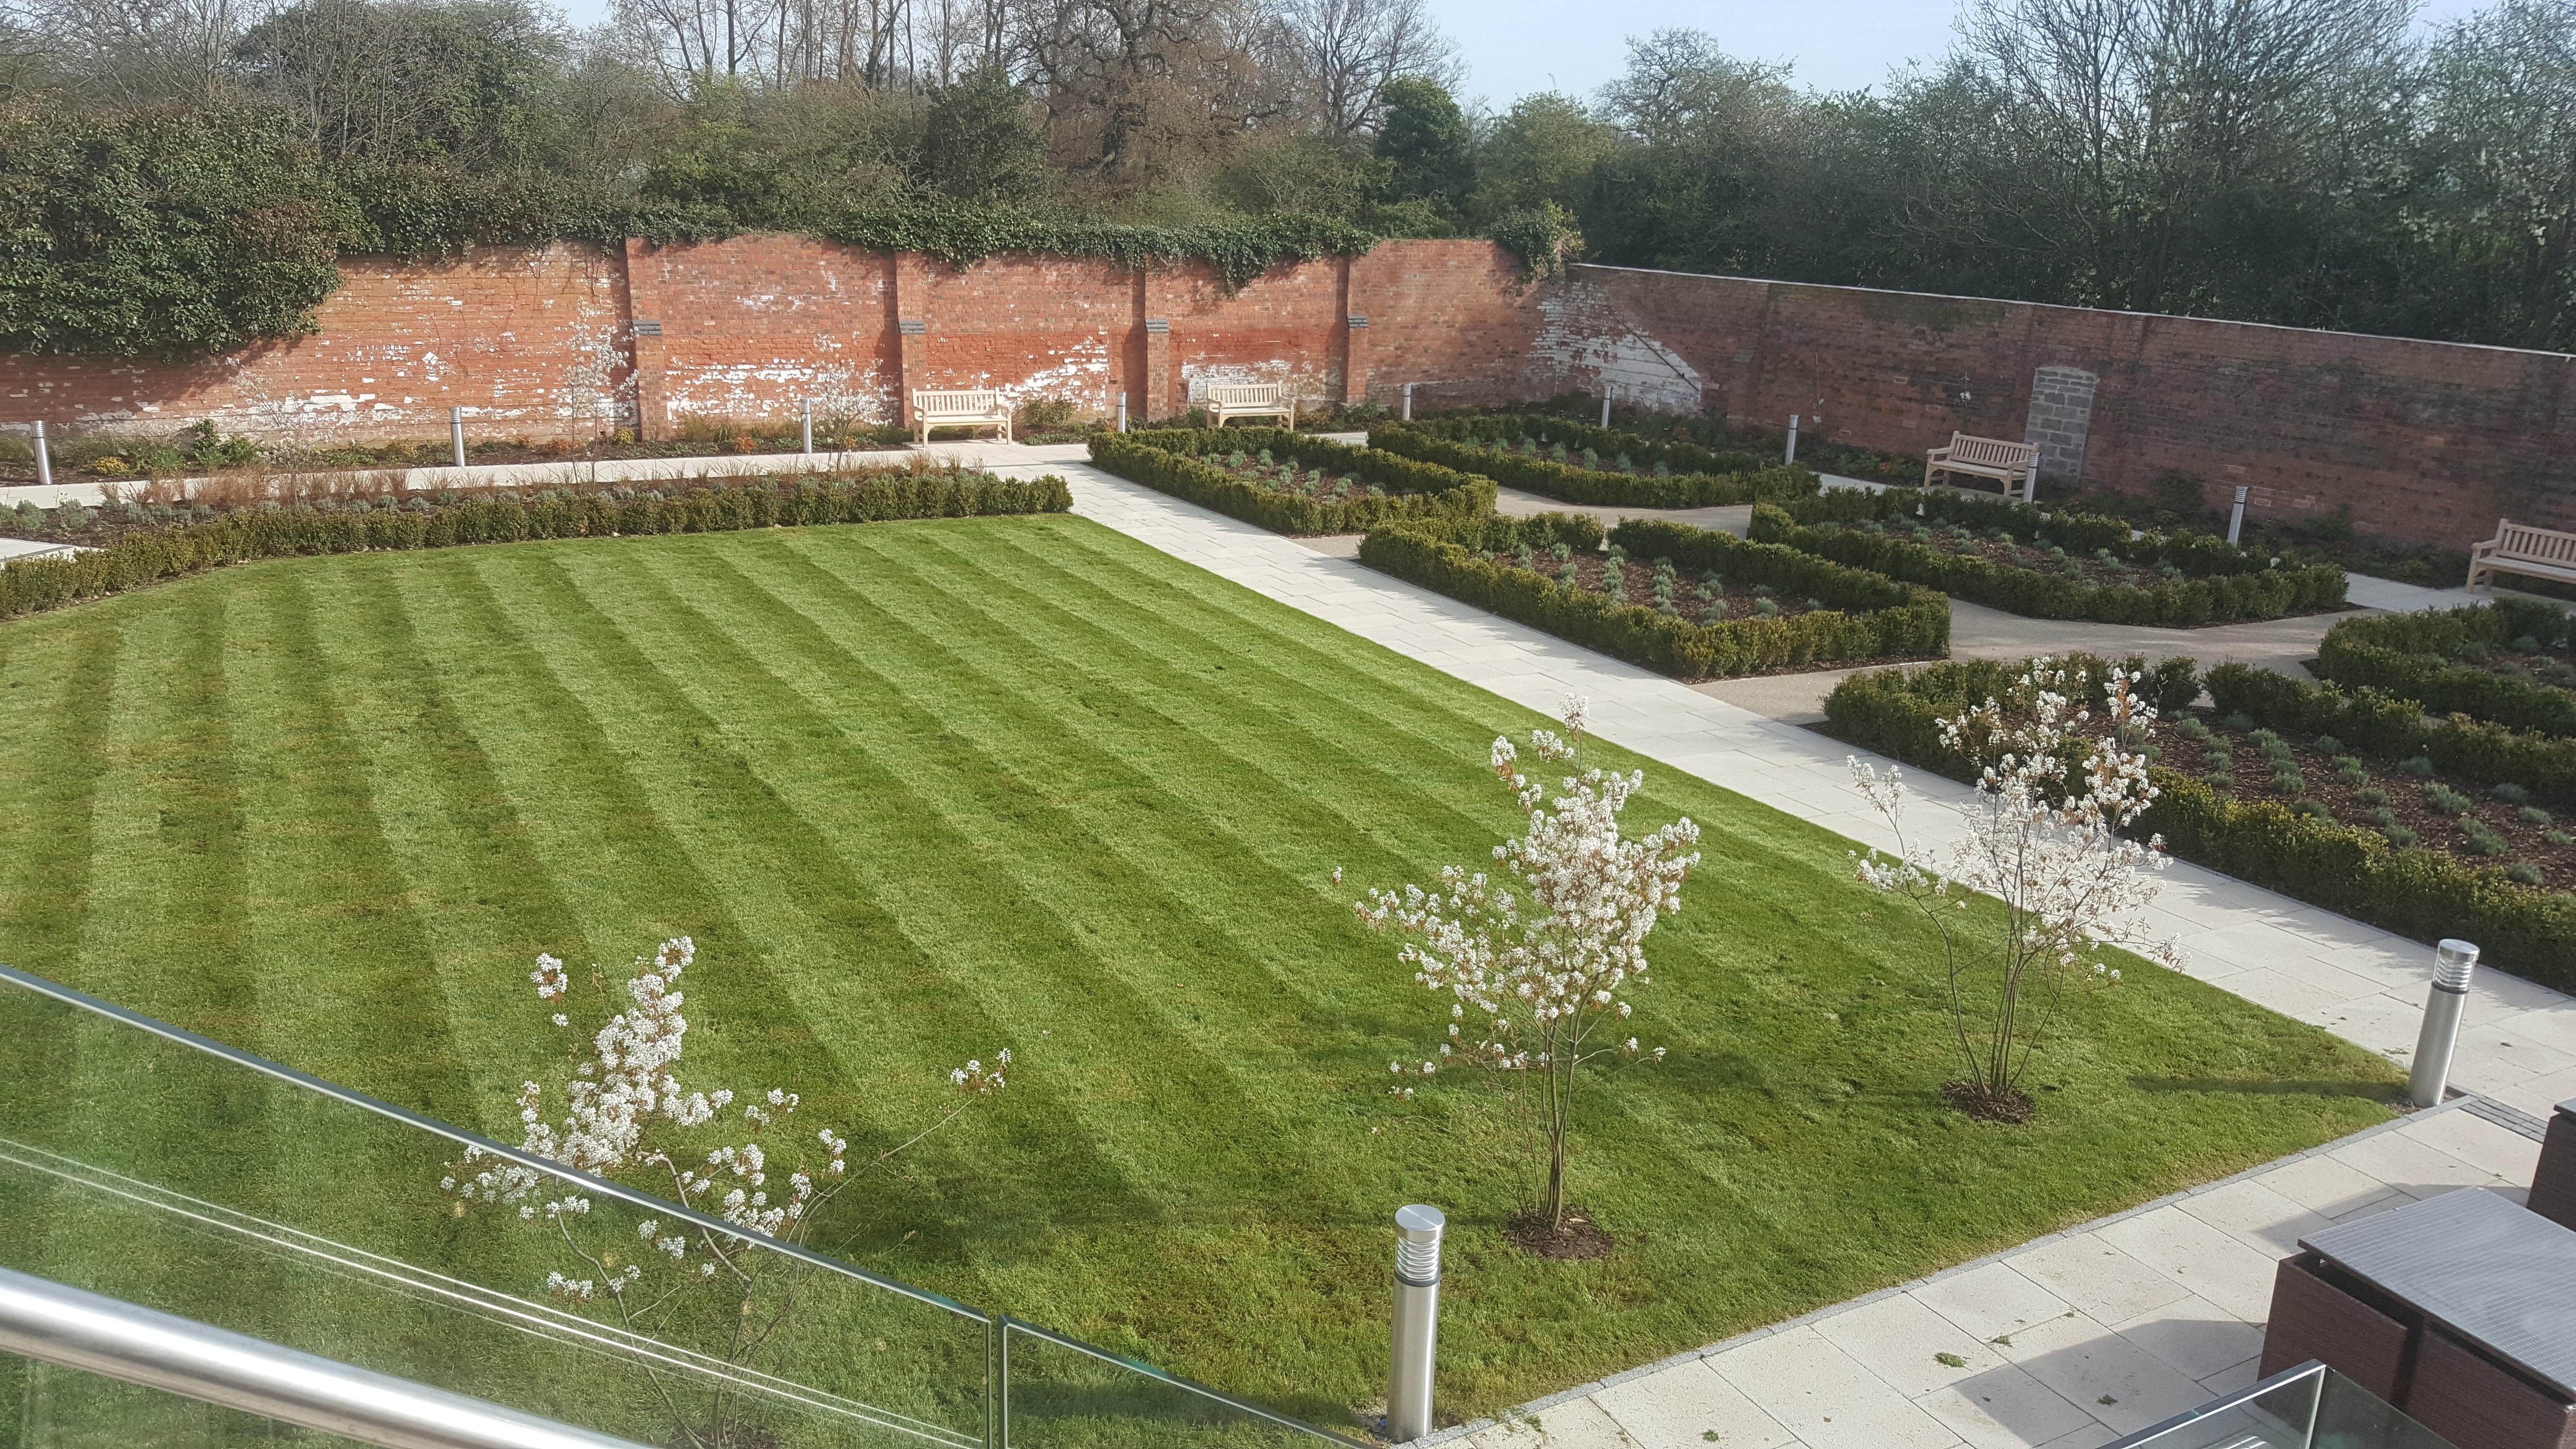 Manchester Garden